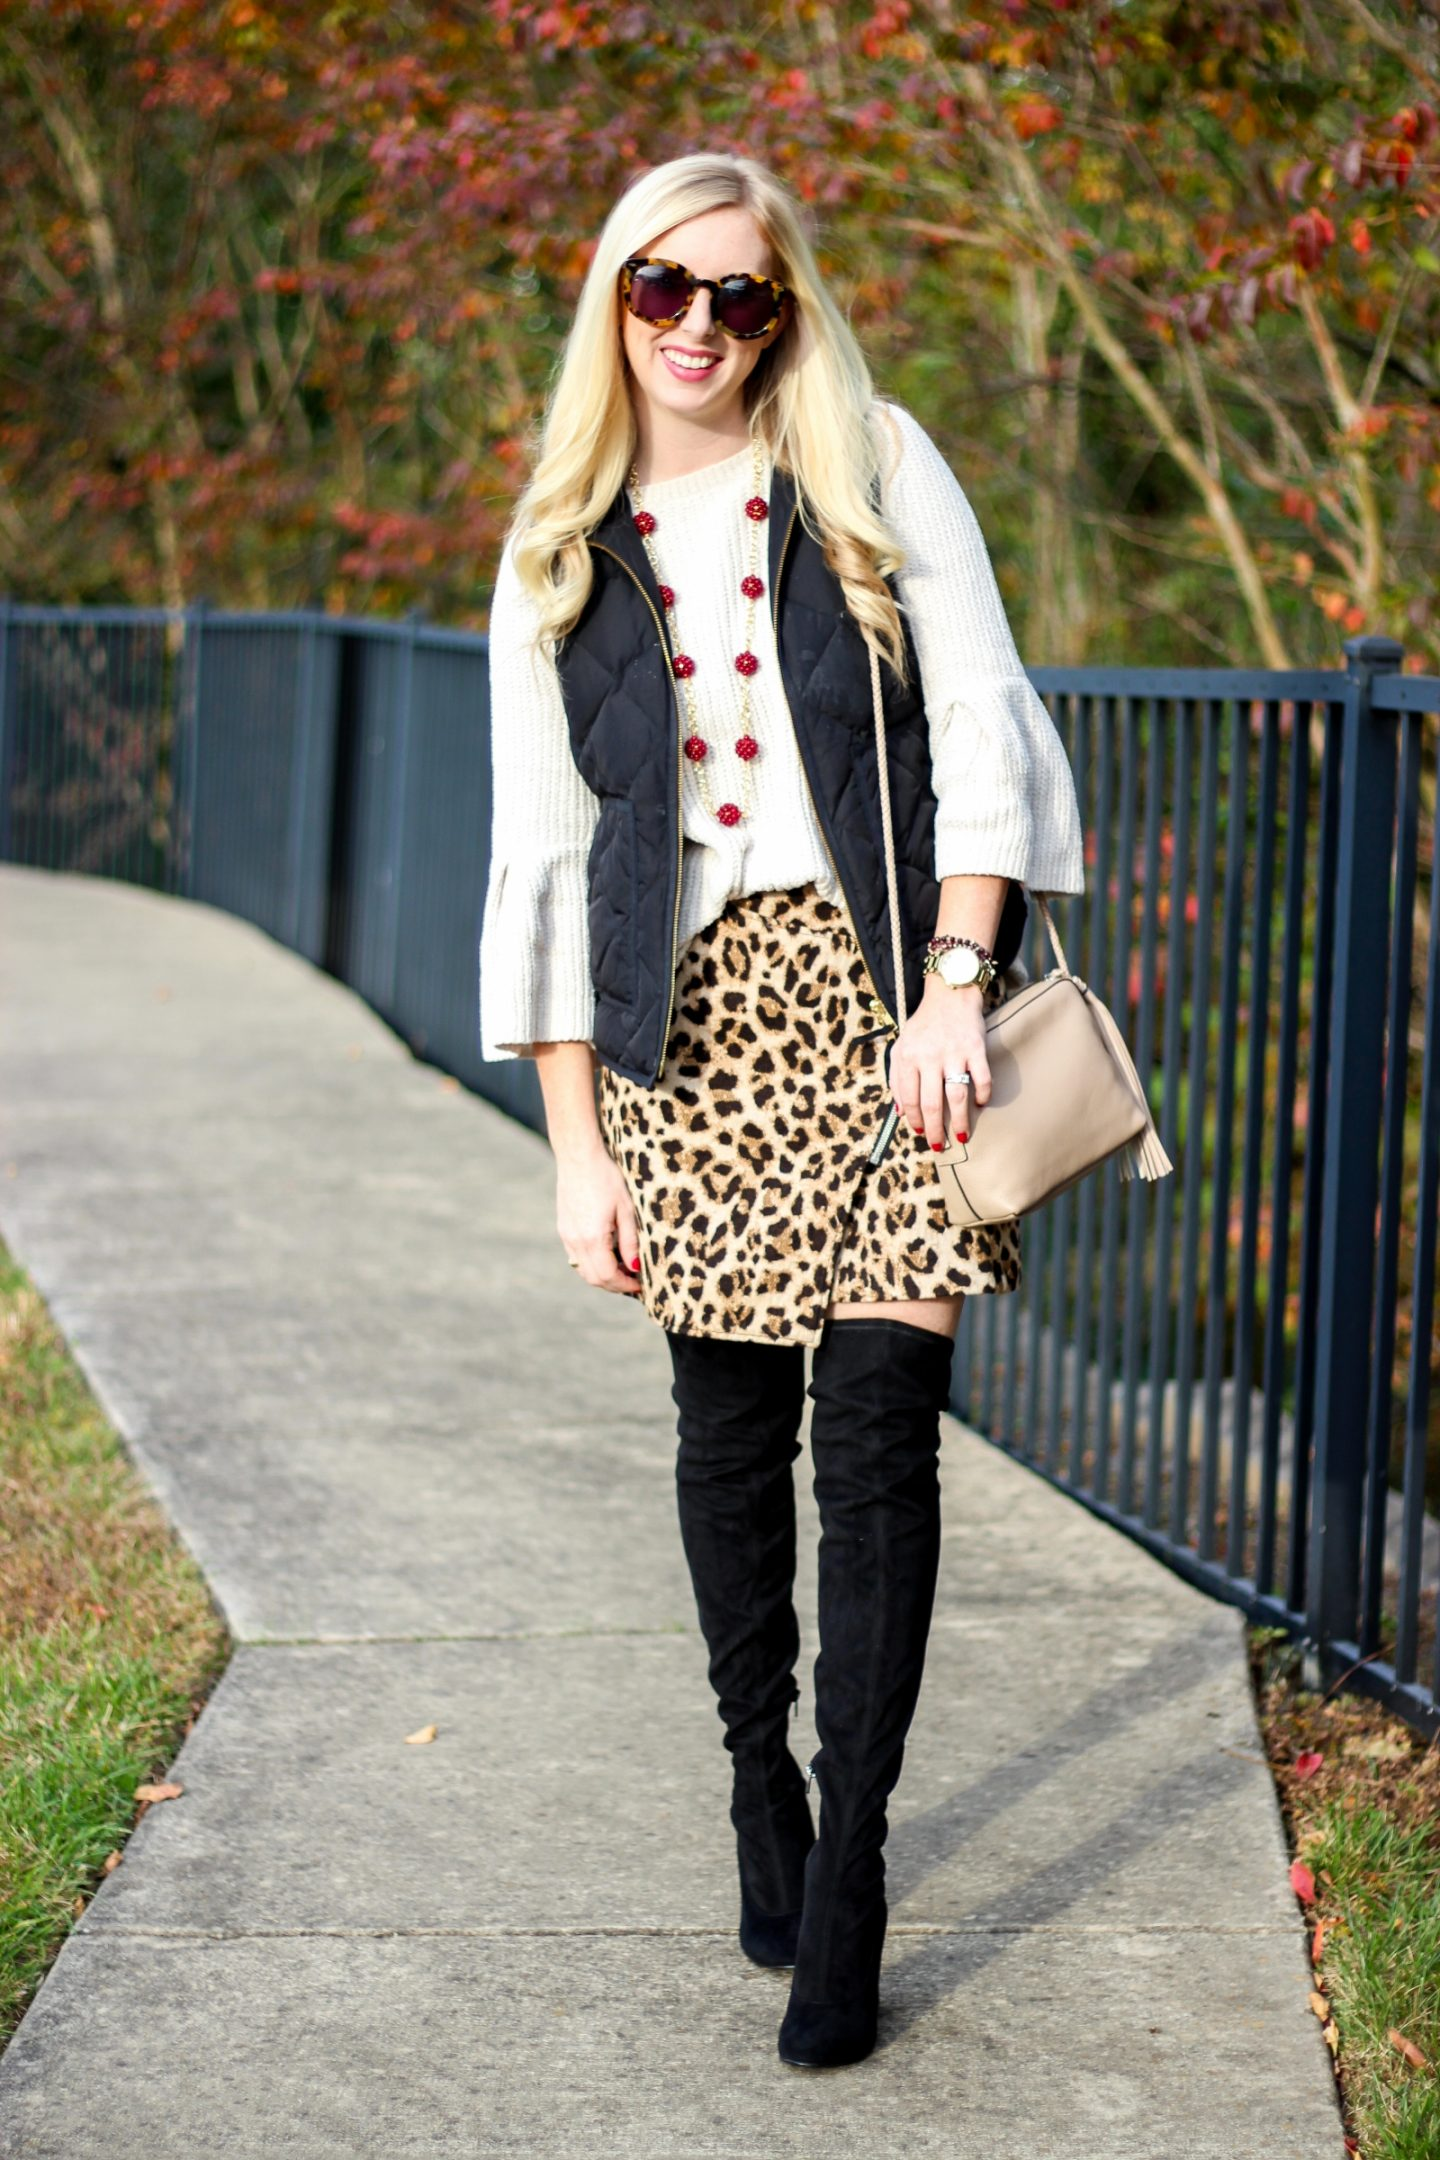 Leopard Skirt Amp Otk Boots H Amp M Fashion Styled Blonde